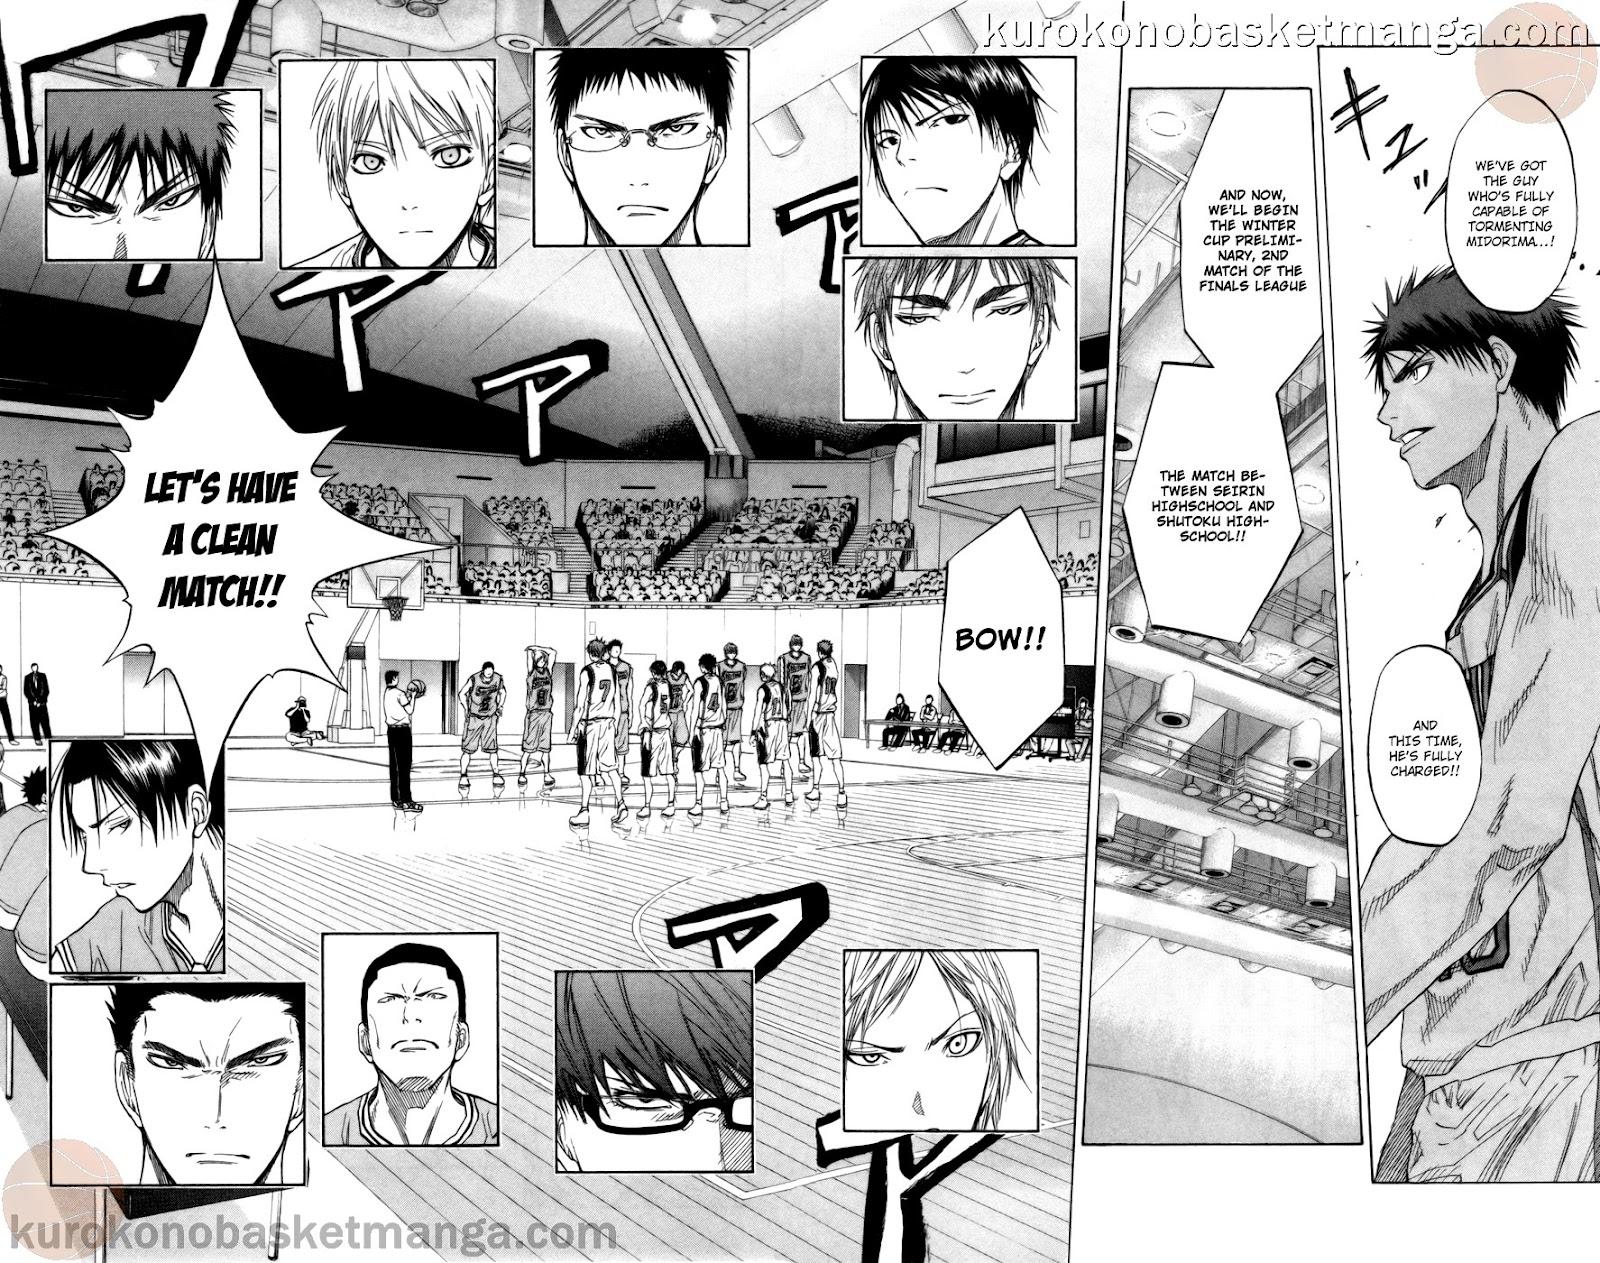 Kuroko no Basket Manga Chapter 86 - Image 04-05